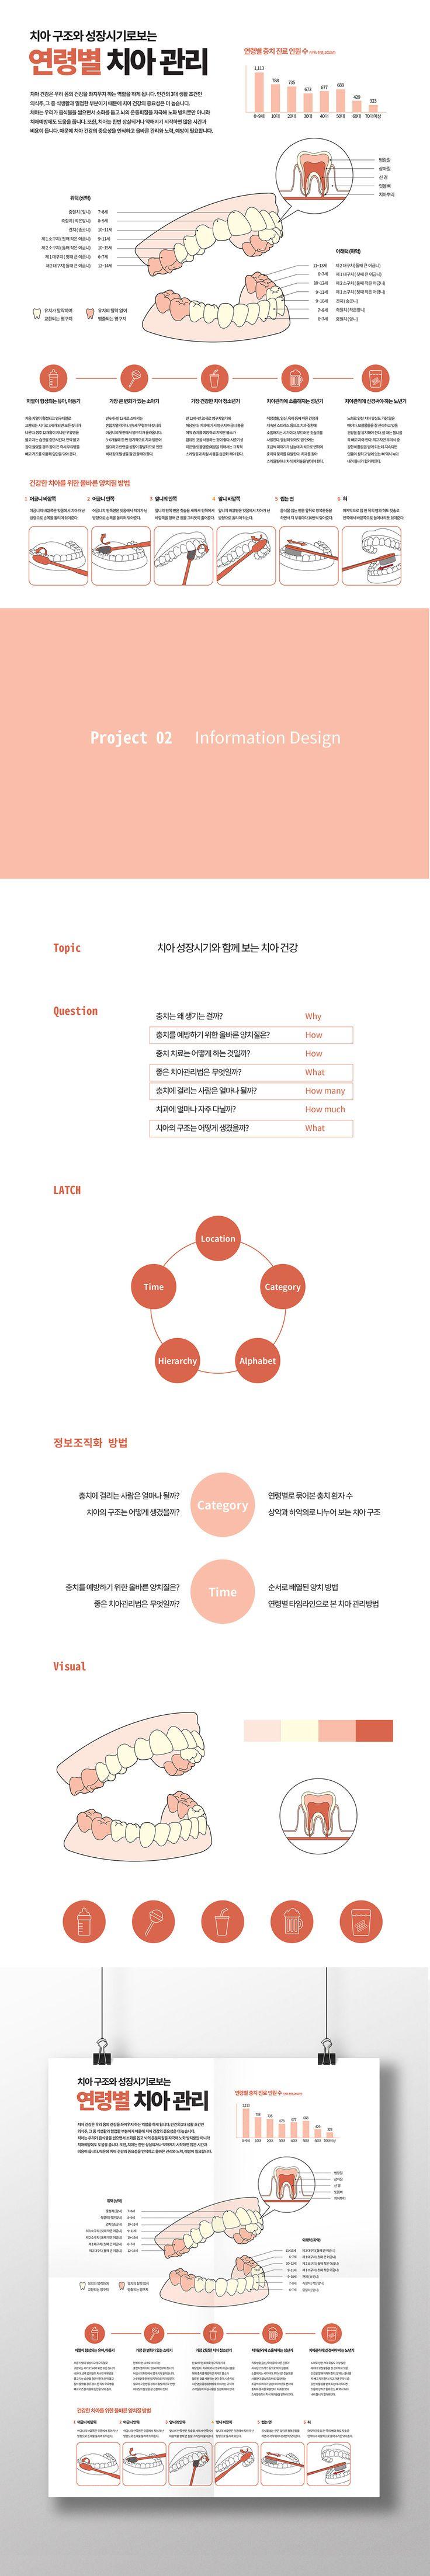 Kim Min-Gyeong│ Information Design 2015│ Major in Digital Media Design │#hicoda │hicoda.hongik.ac.kr